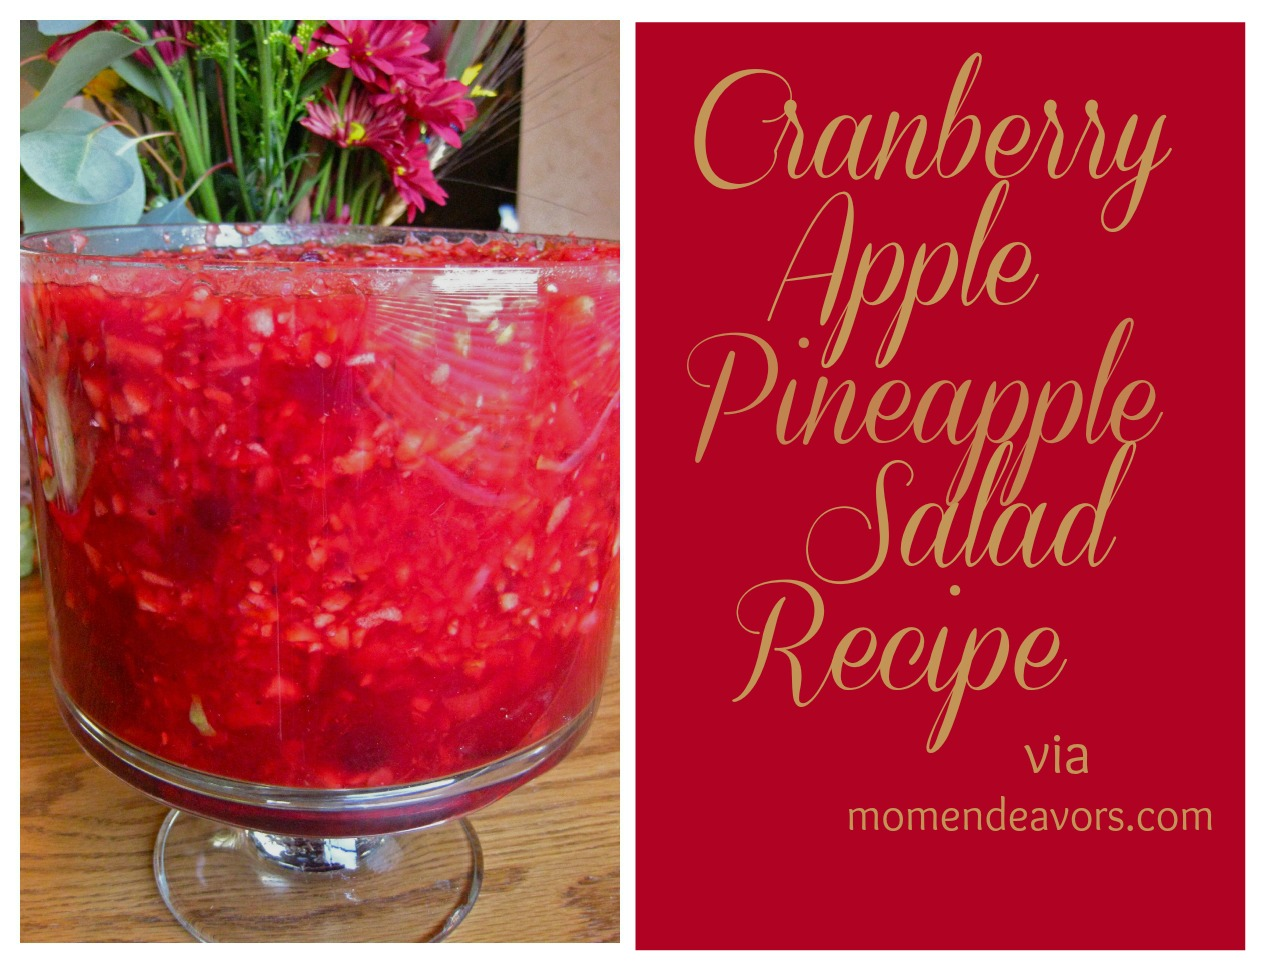 Cornucopia of Creativity: Cranberry Apple Pineapple Salad